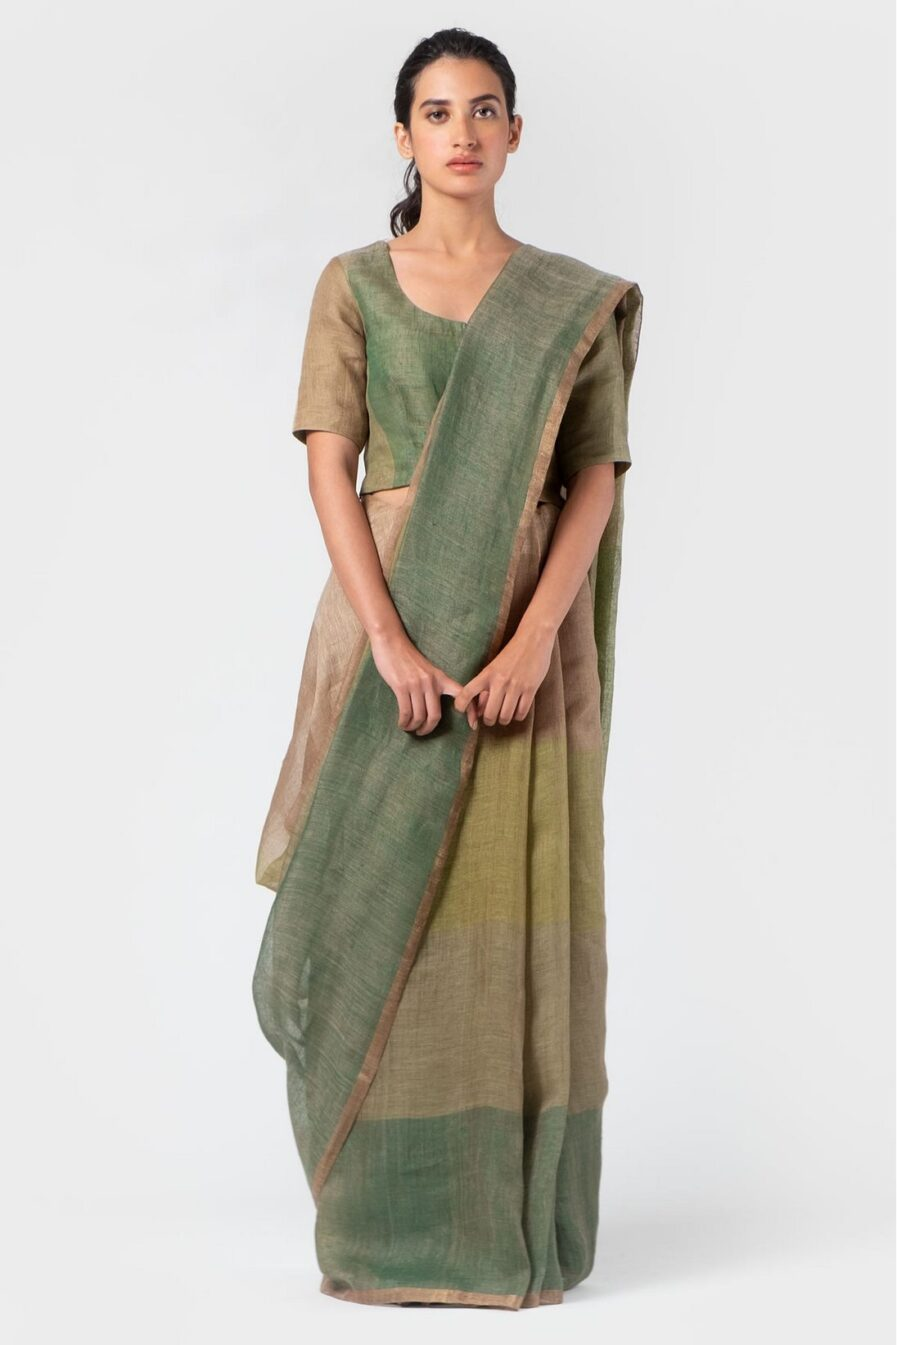 Anavila Graded basil summer sari